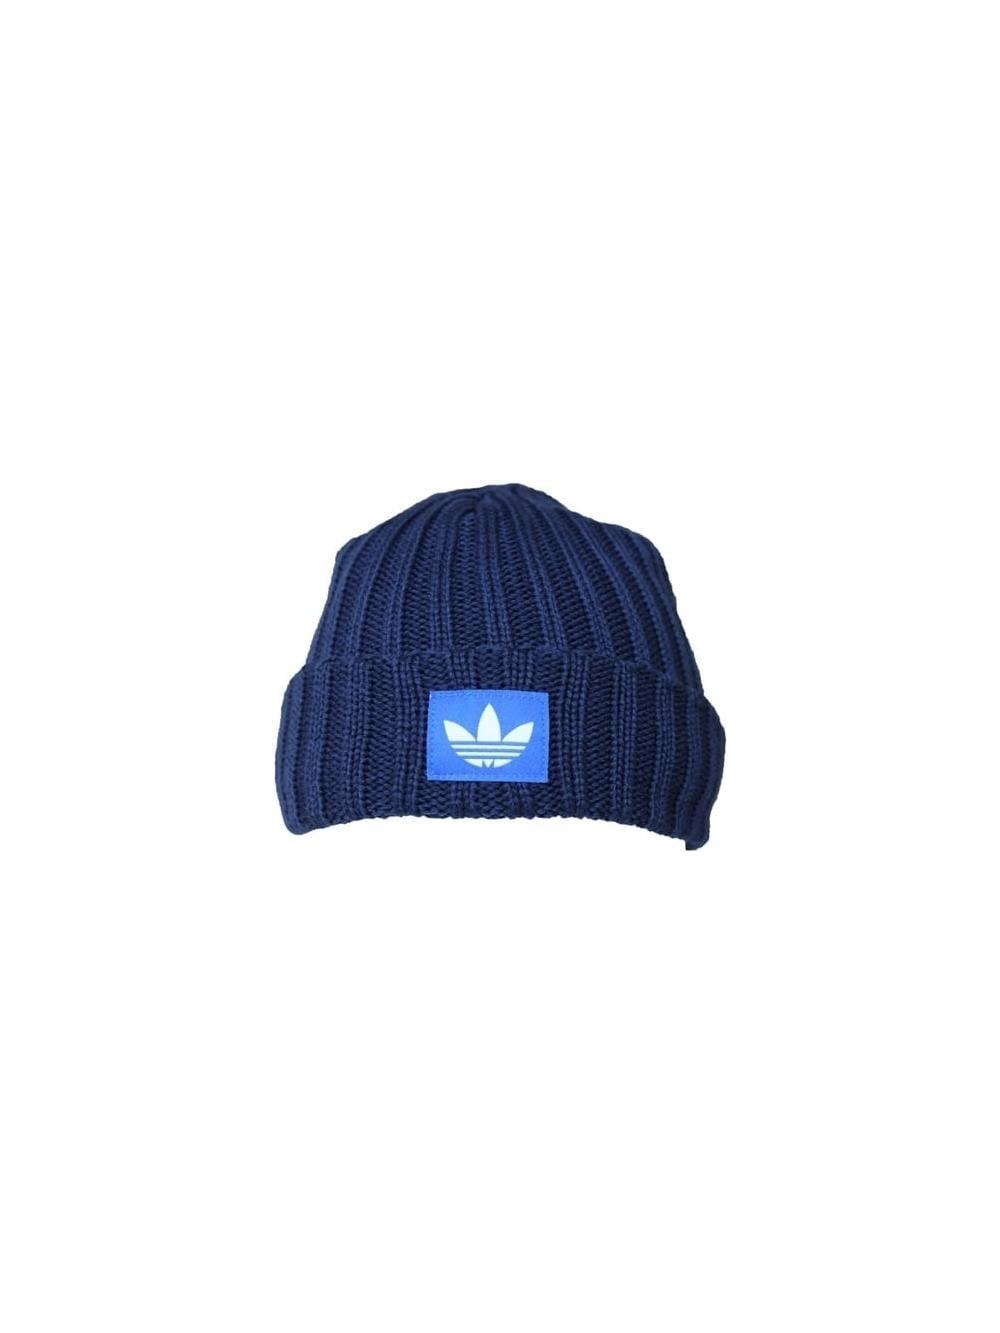 bcc5fdebafb adidas FM Beanie Trefoil Hat in Navy - Northern Threads